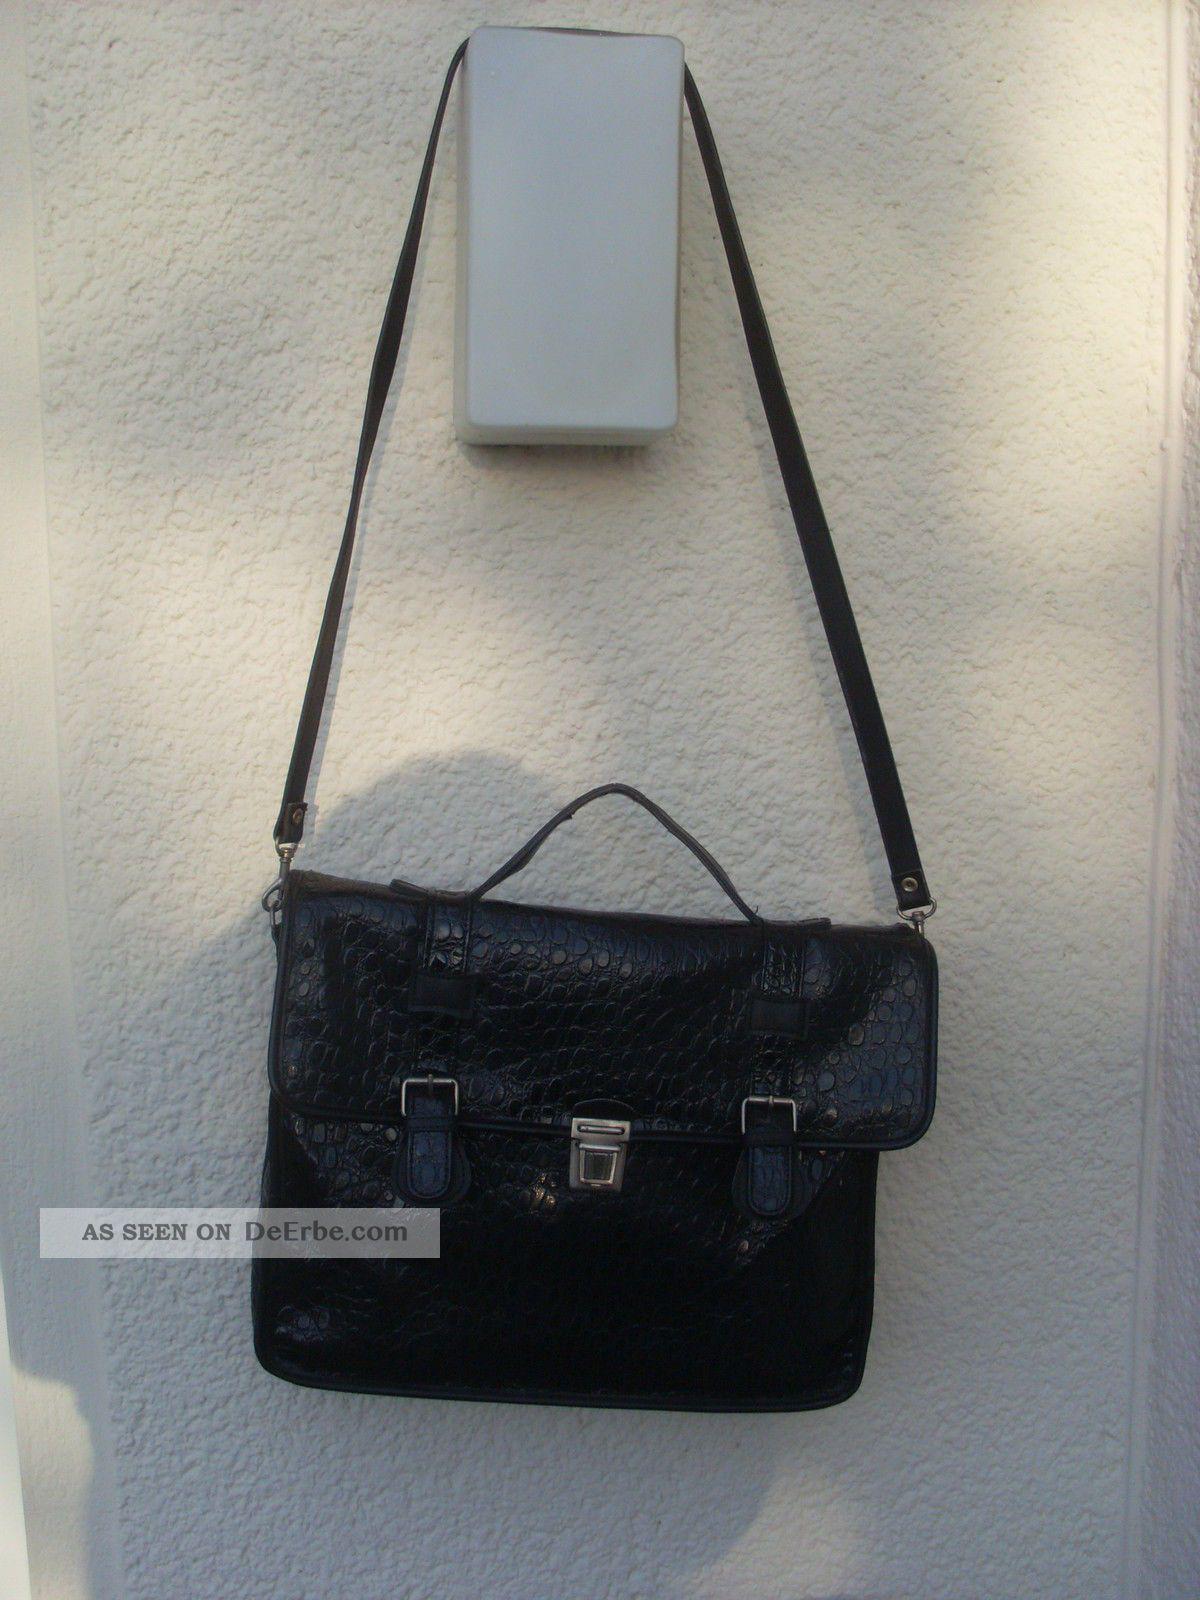 Picard Handtasche Umhangetasche Reptilienoptik Schwarz Vintage 80er